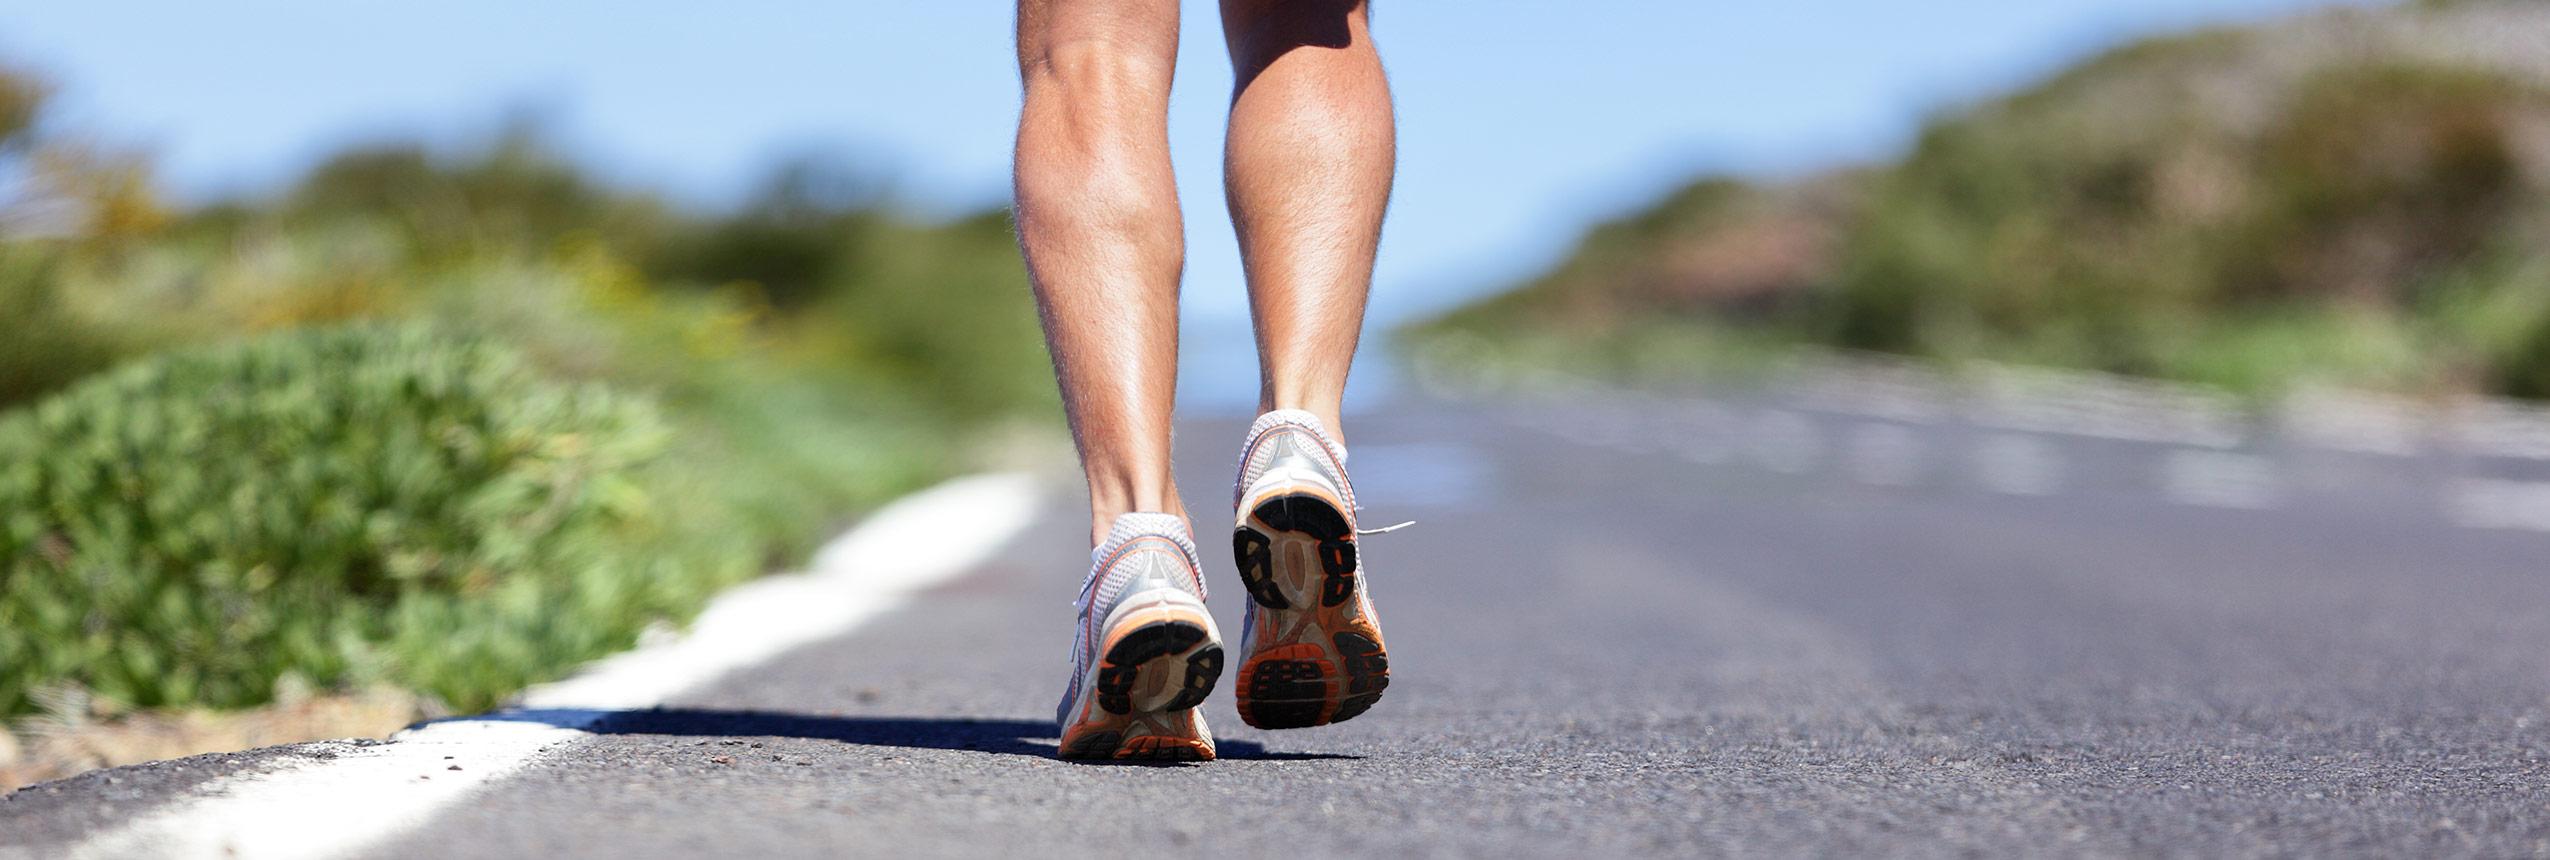 achillodynie muenchen orthopaede - Achillodynie